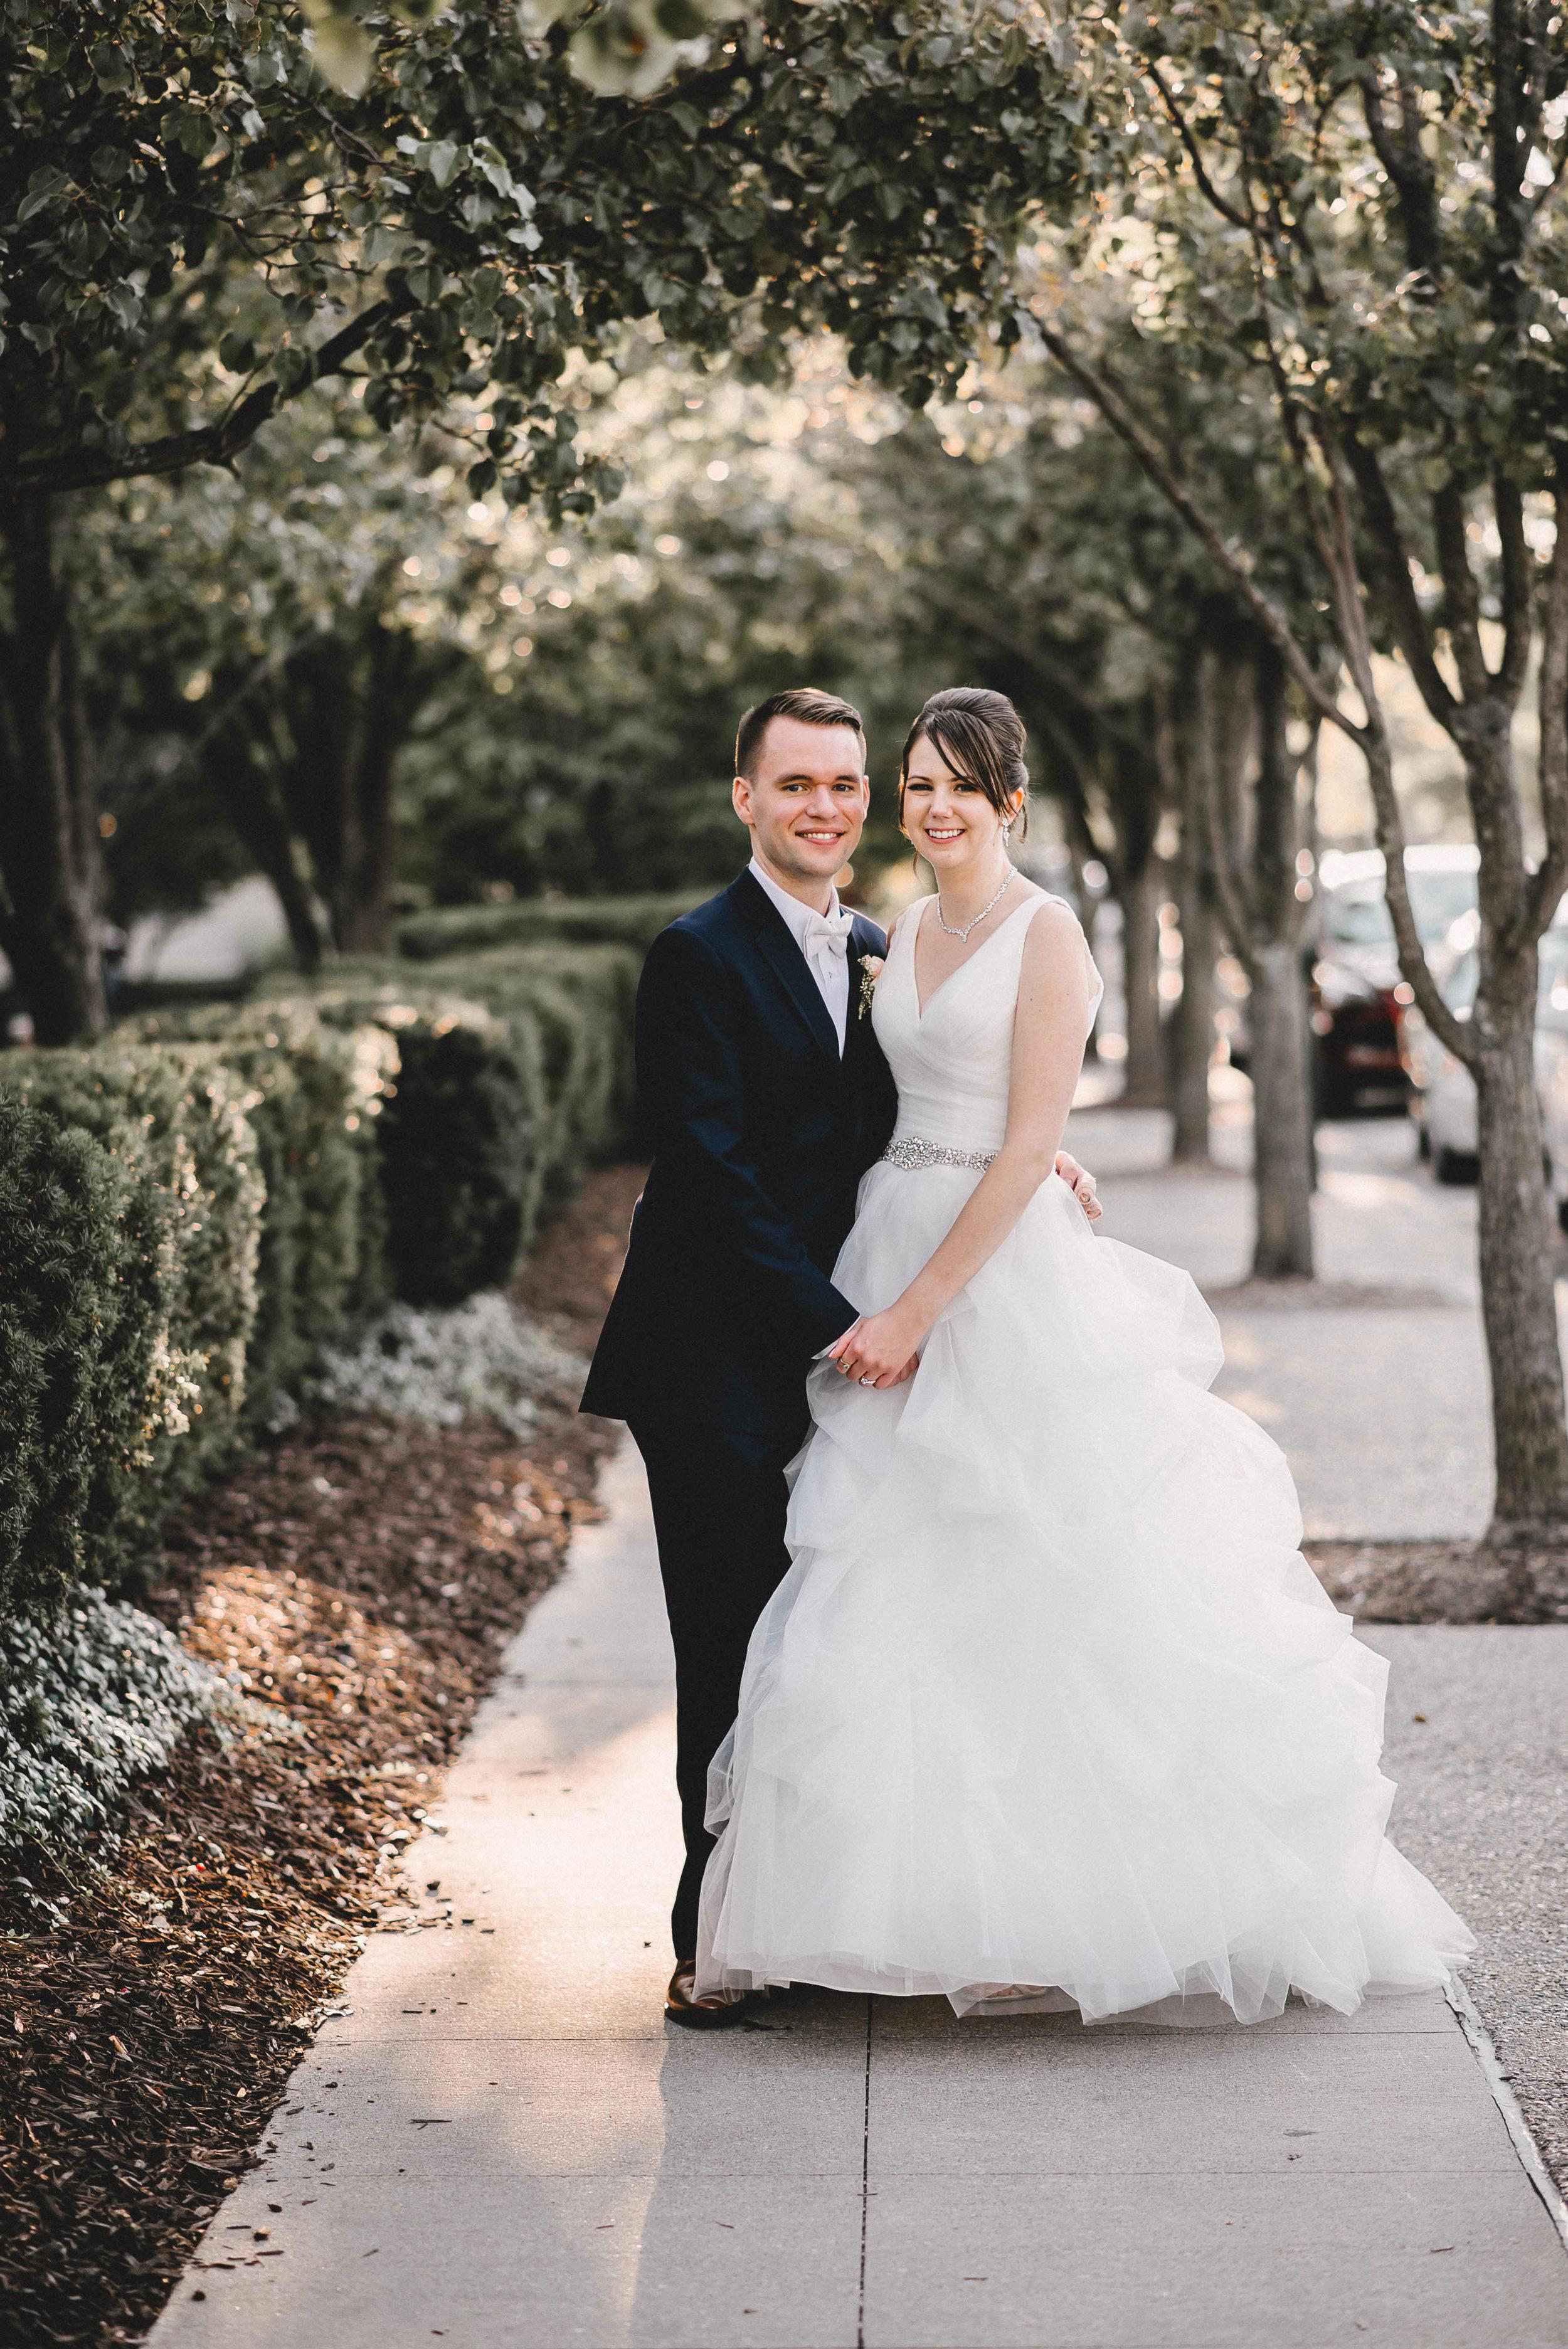 Kara and Mike Wedding-20160904-18-47-14.jpg